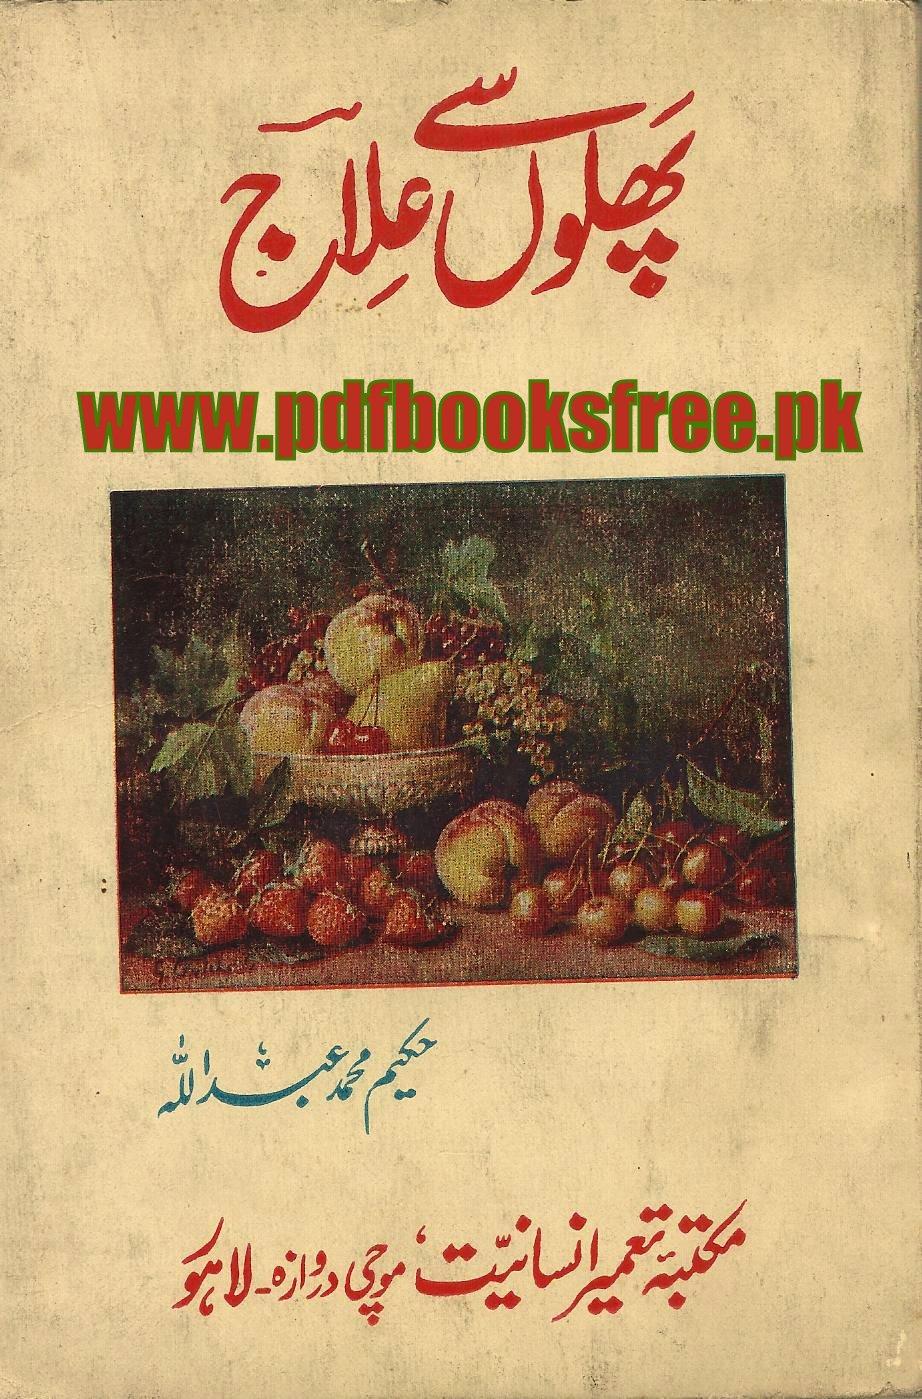 PDF BOOKS FREE URDU NOVEL DOWNLOAD